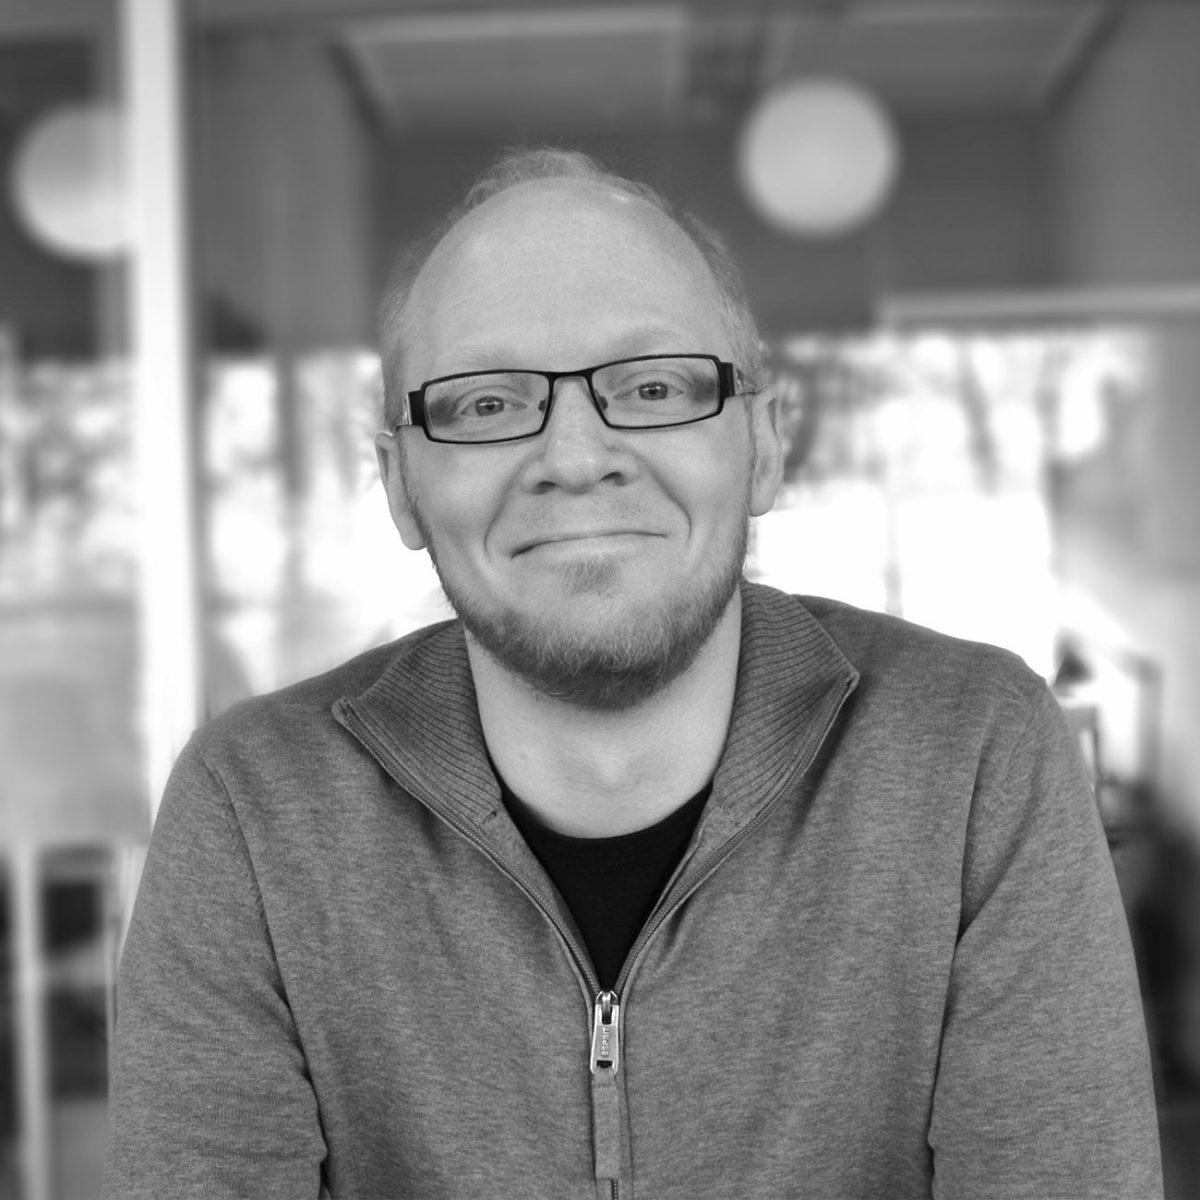 http://horisontgruppen.dk/wp-content/uploads/2016/04/Anders-1200x1200.jpg